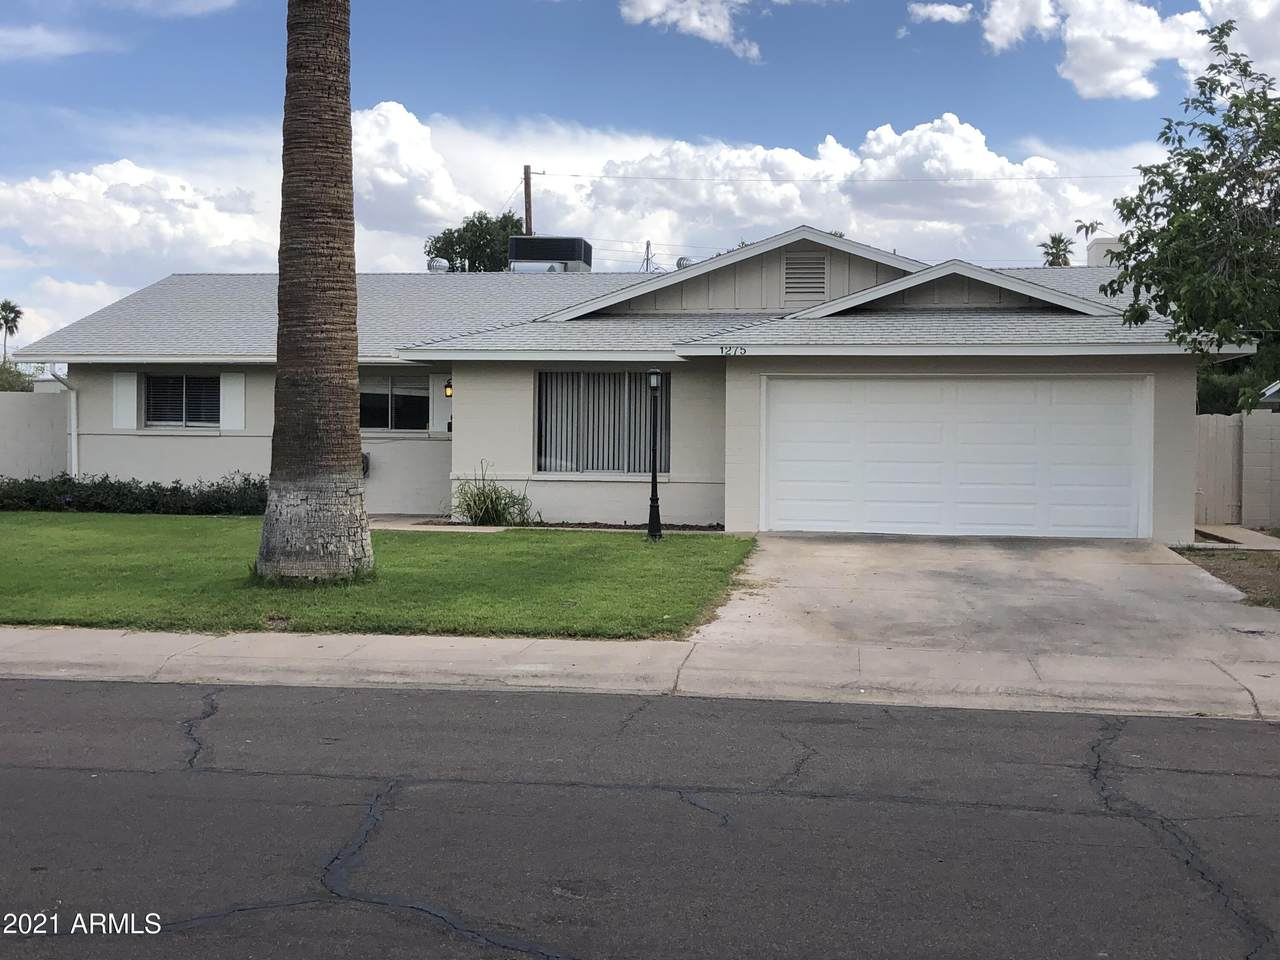 1275 Loma Vista Drive - Photo 1